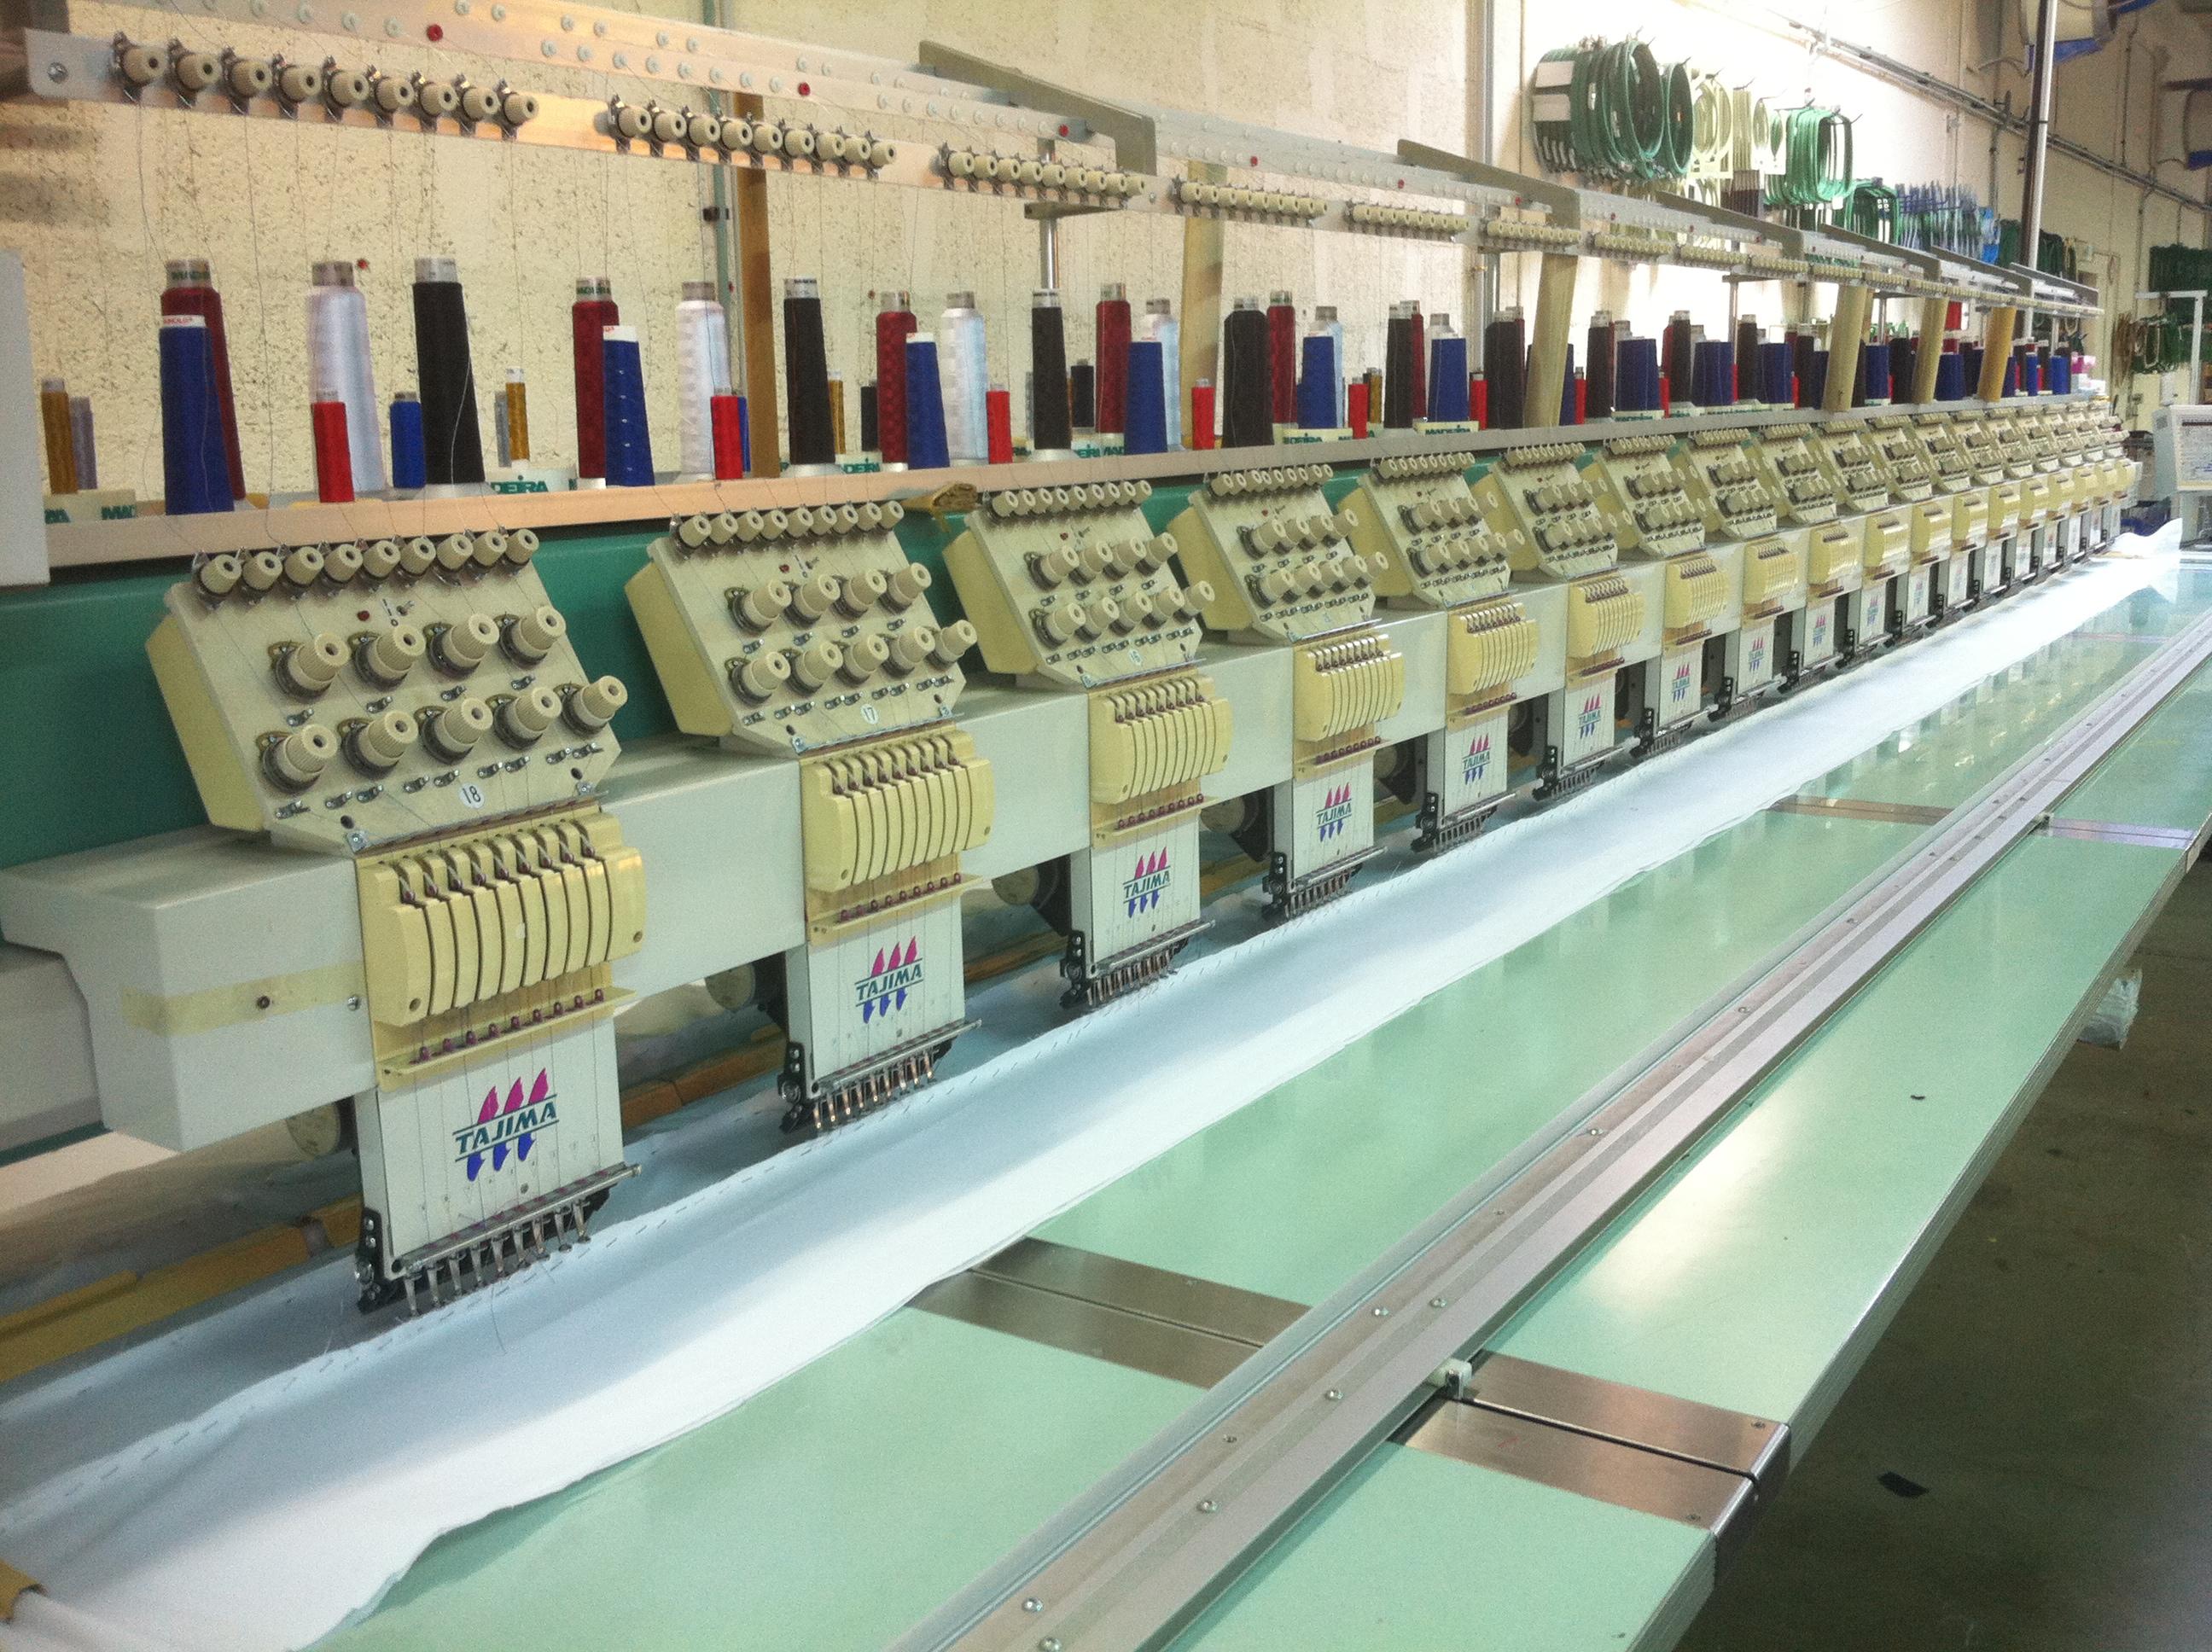 Used TAJIMA TMFD-G918 Multi-heads embroidery machine - Exapro